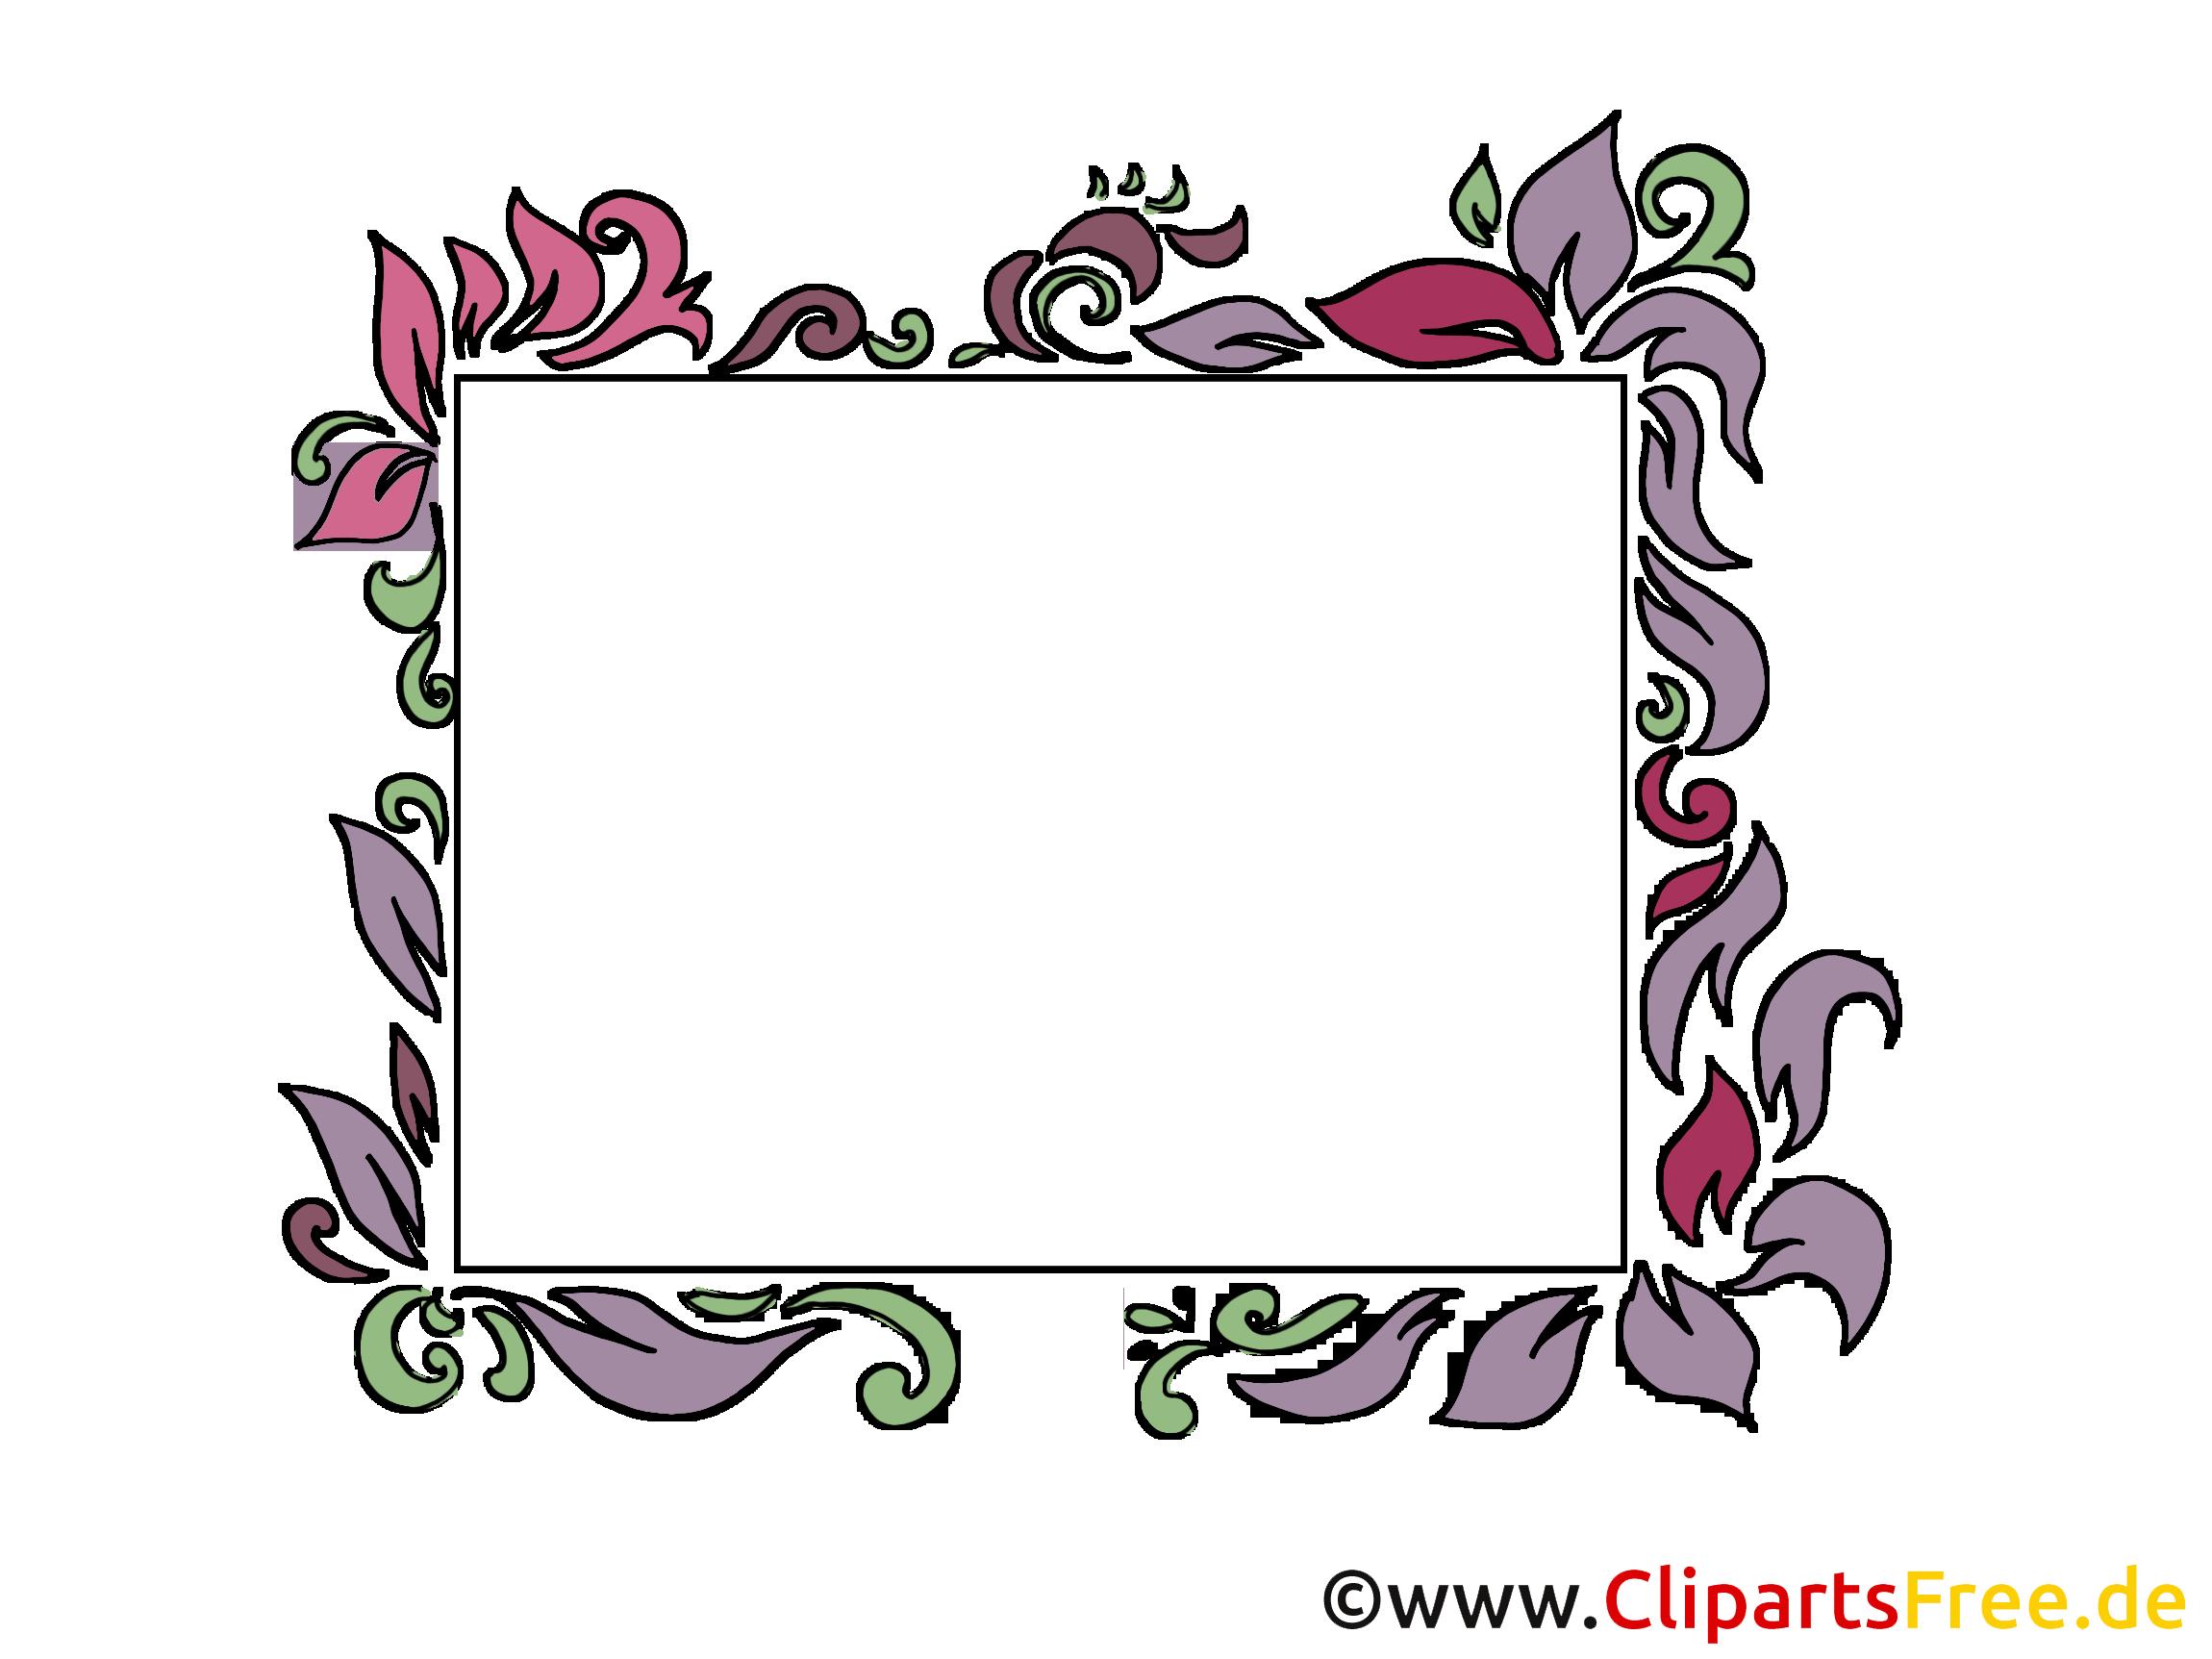 Dessin rectangle cadre t l charger cadres dessin picture image graphic clip art - Dessin a telecharger ...